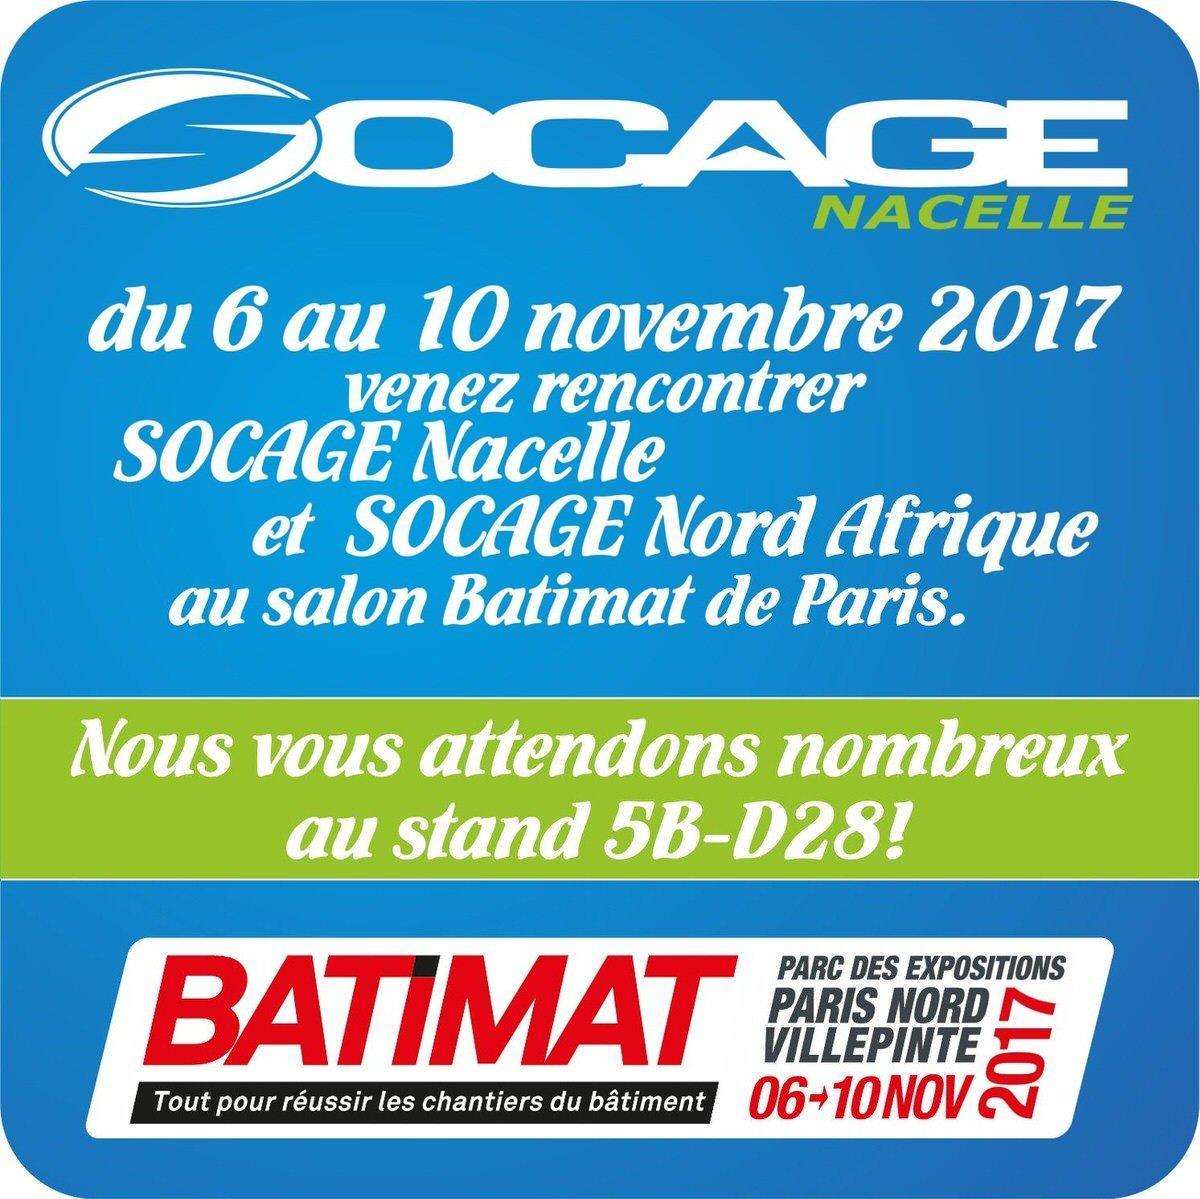 socage nacelle e nord afrique batimat banner articolo 1 1